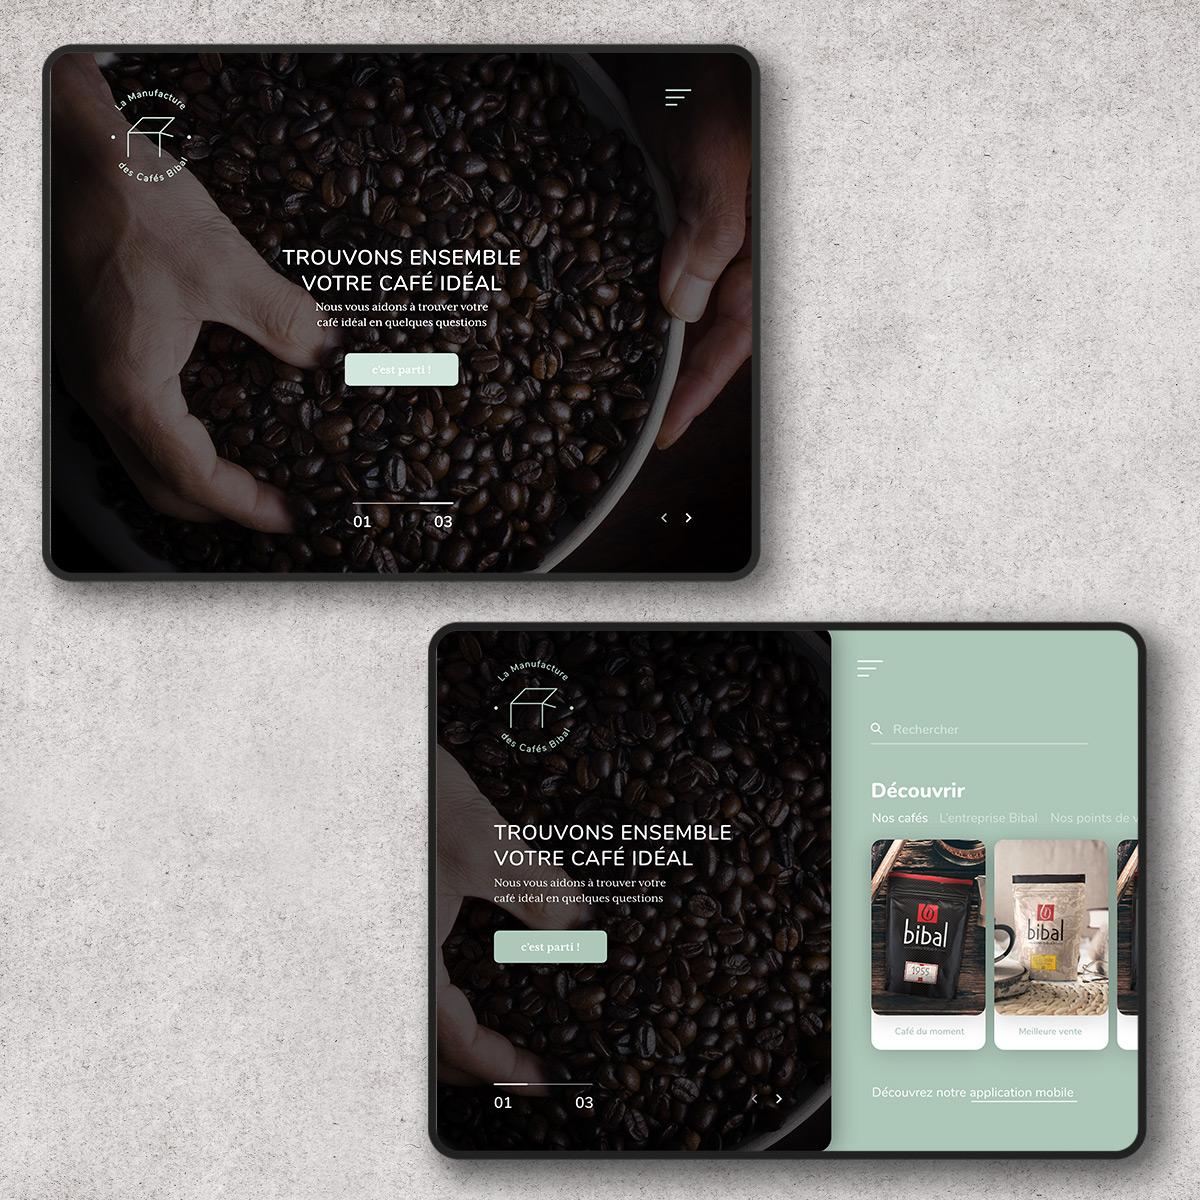 https://isse-ari-design.fr/wp-content/uploads/2020/08/ipad-first-bibal-2.jpg